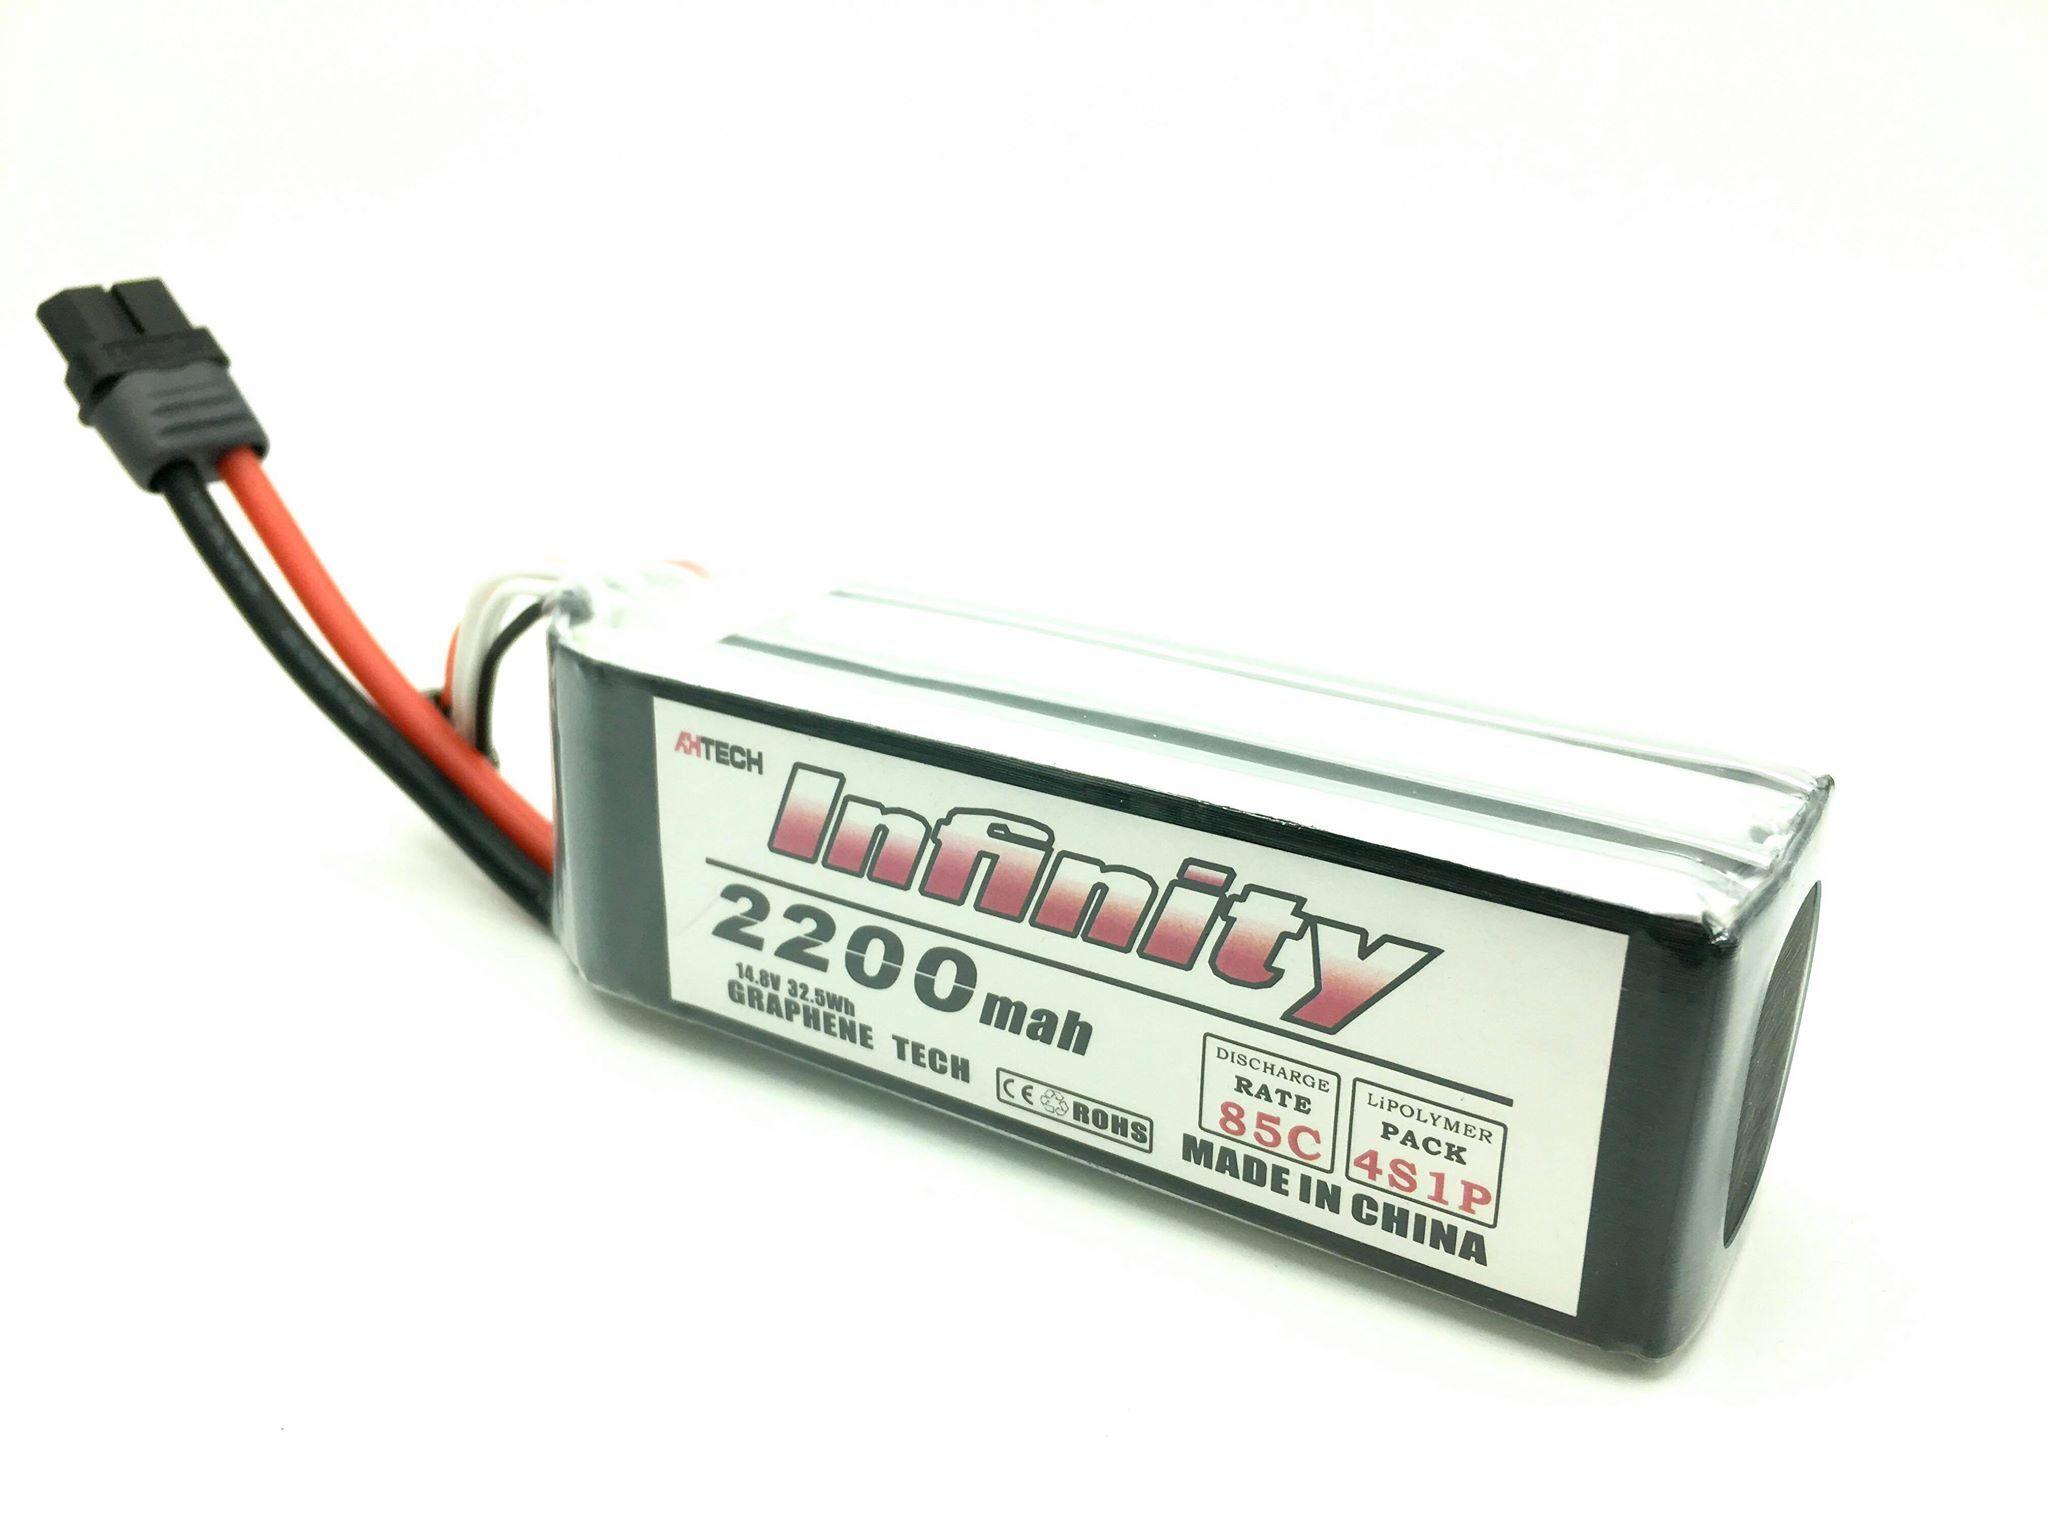 Infinity 2200mah 4s 85c graphene tech lipo battery lipo